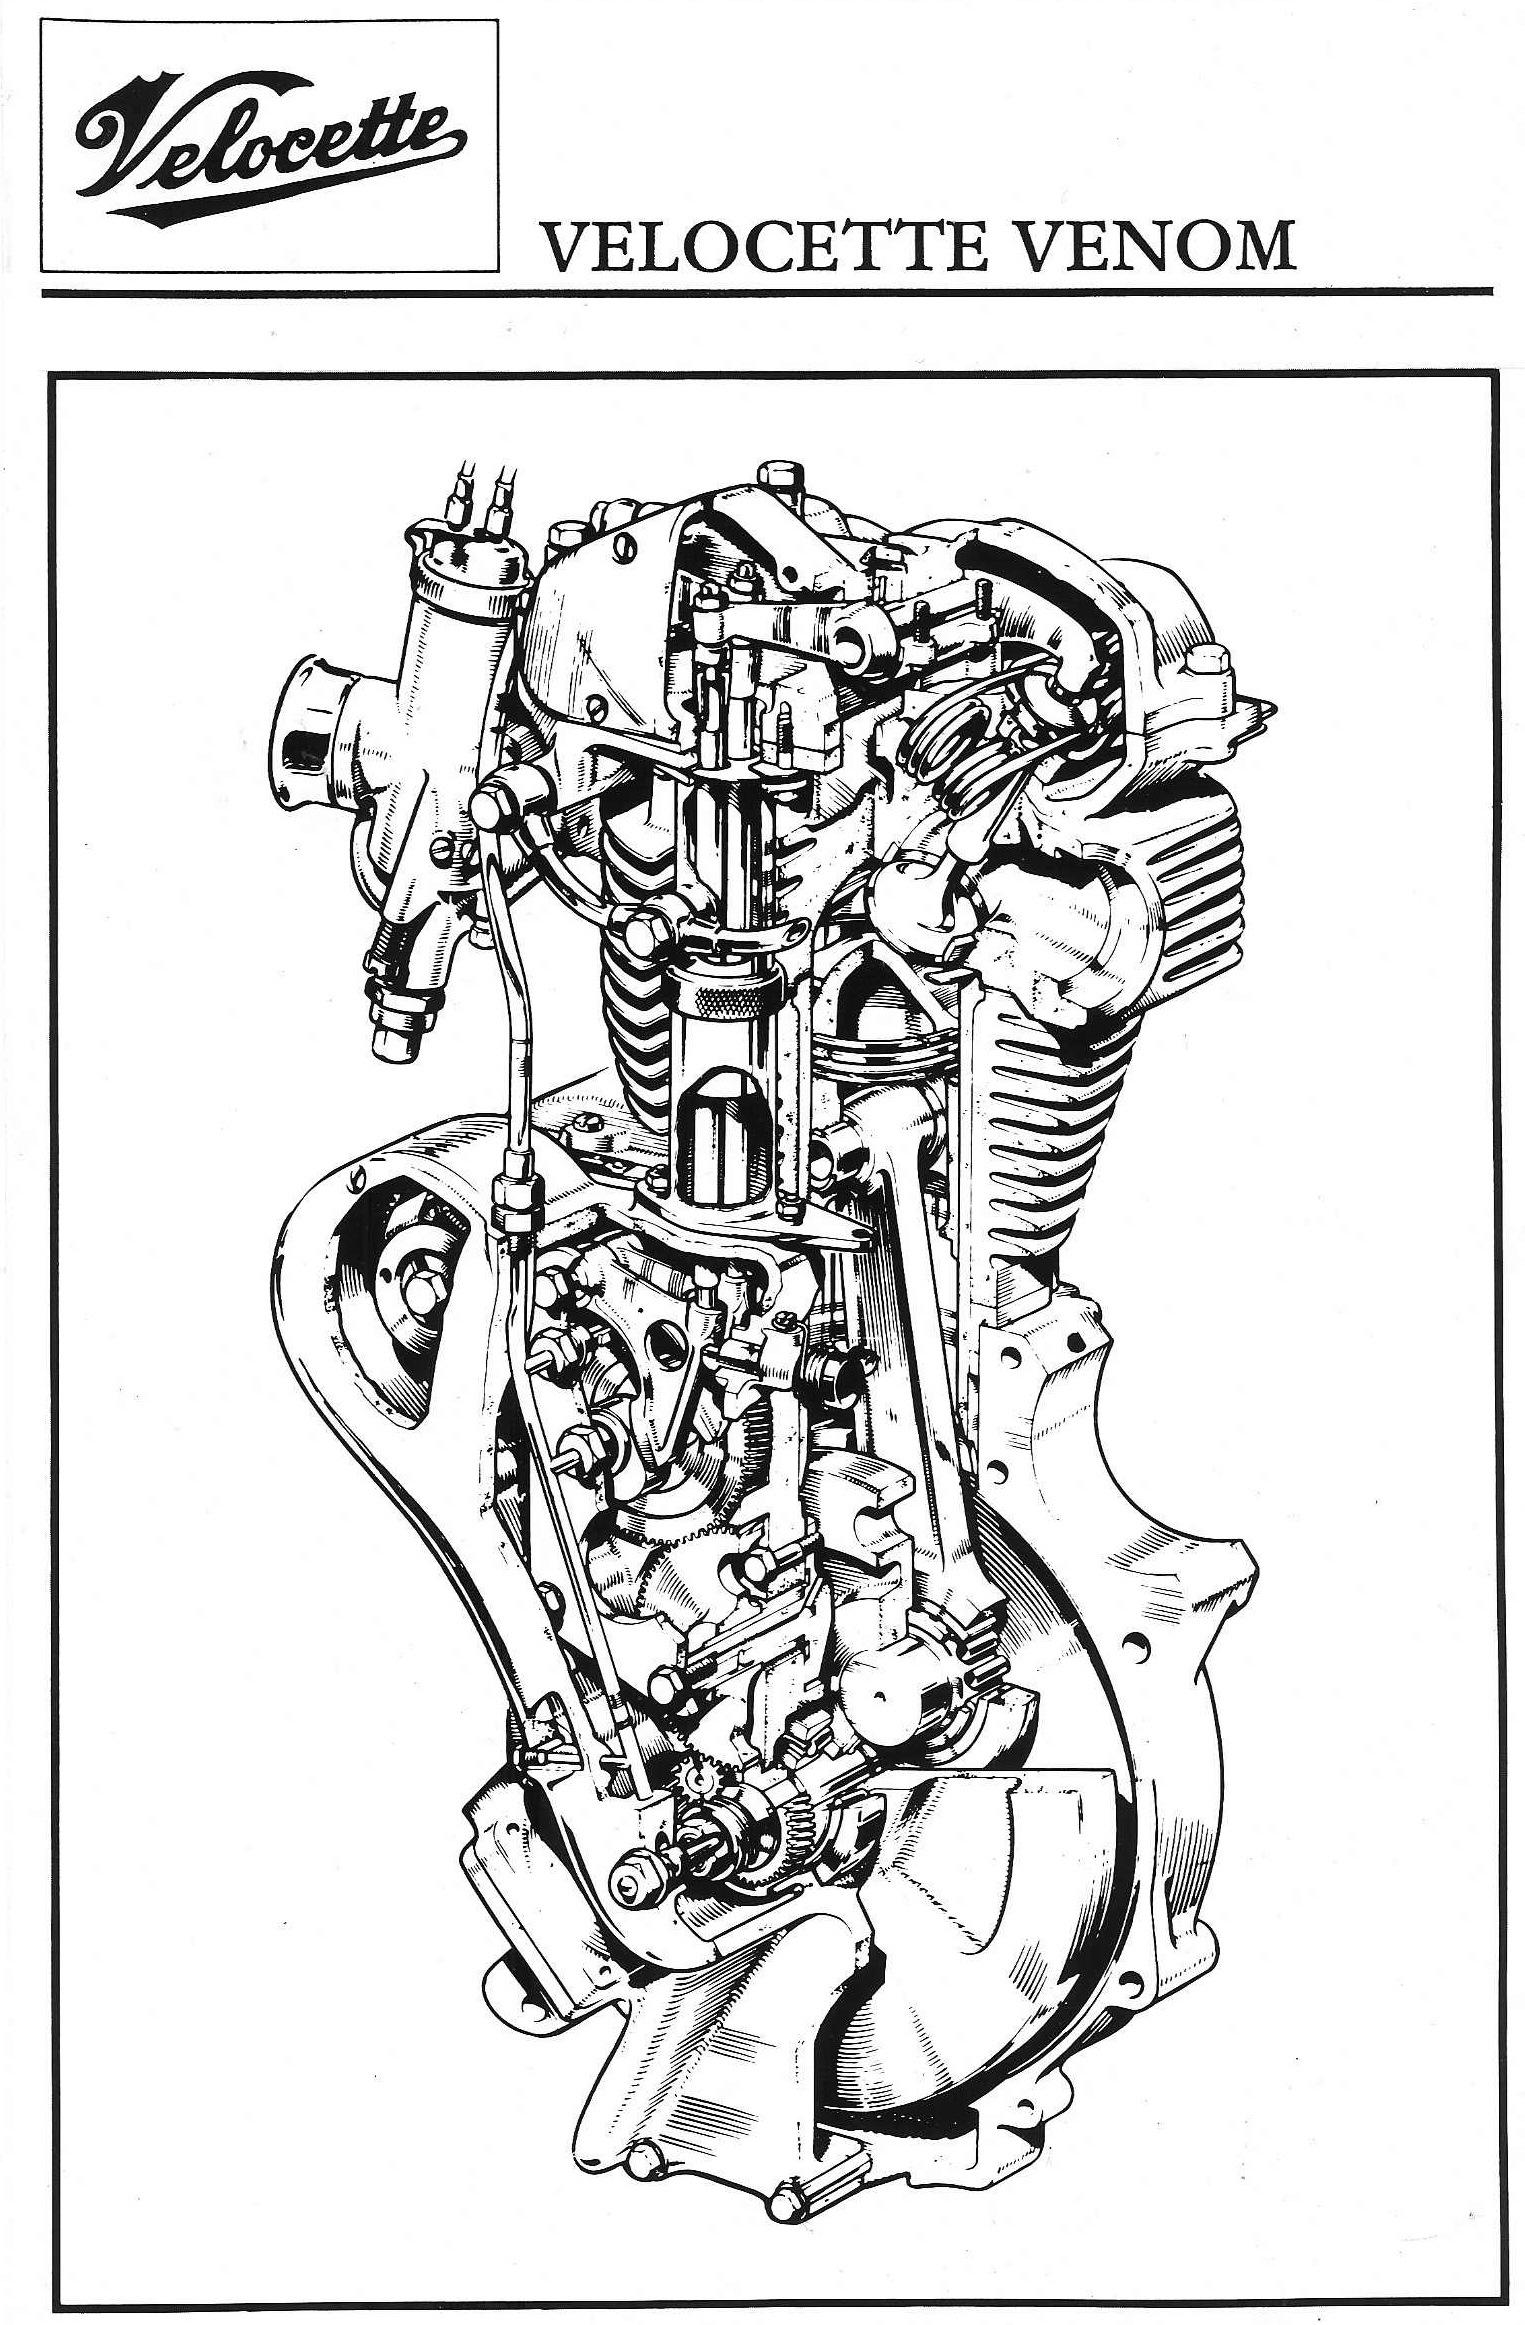 Viper Motorcycle Exhaust